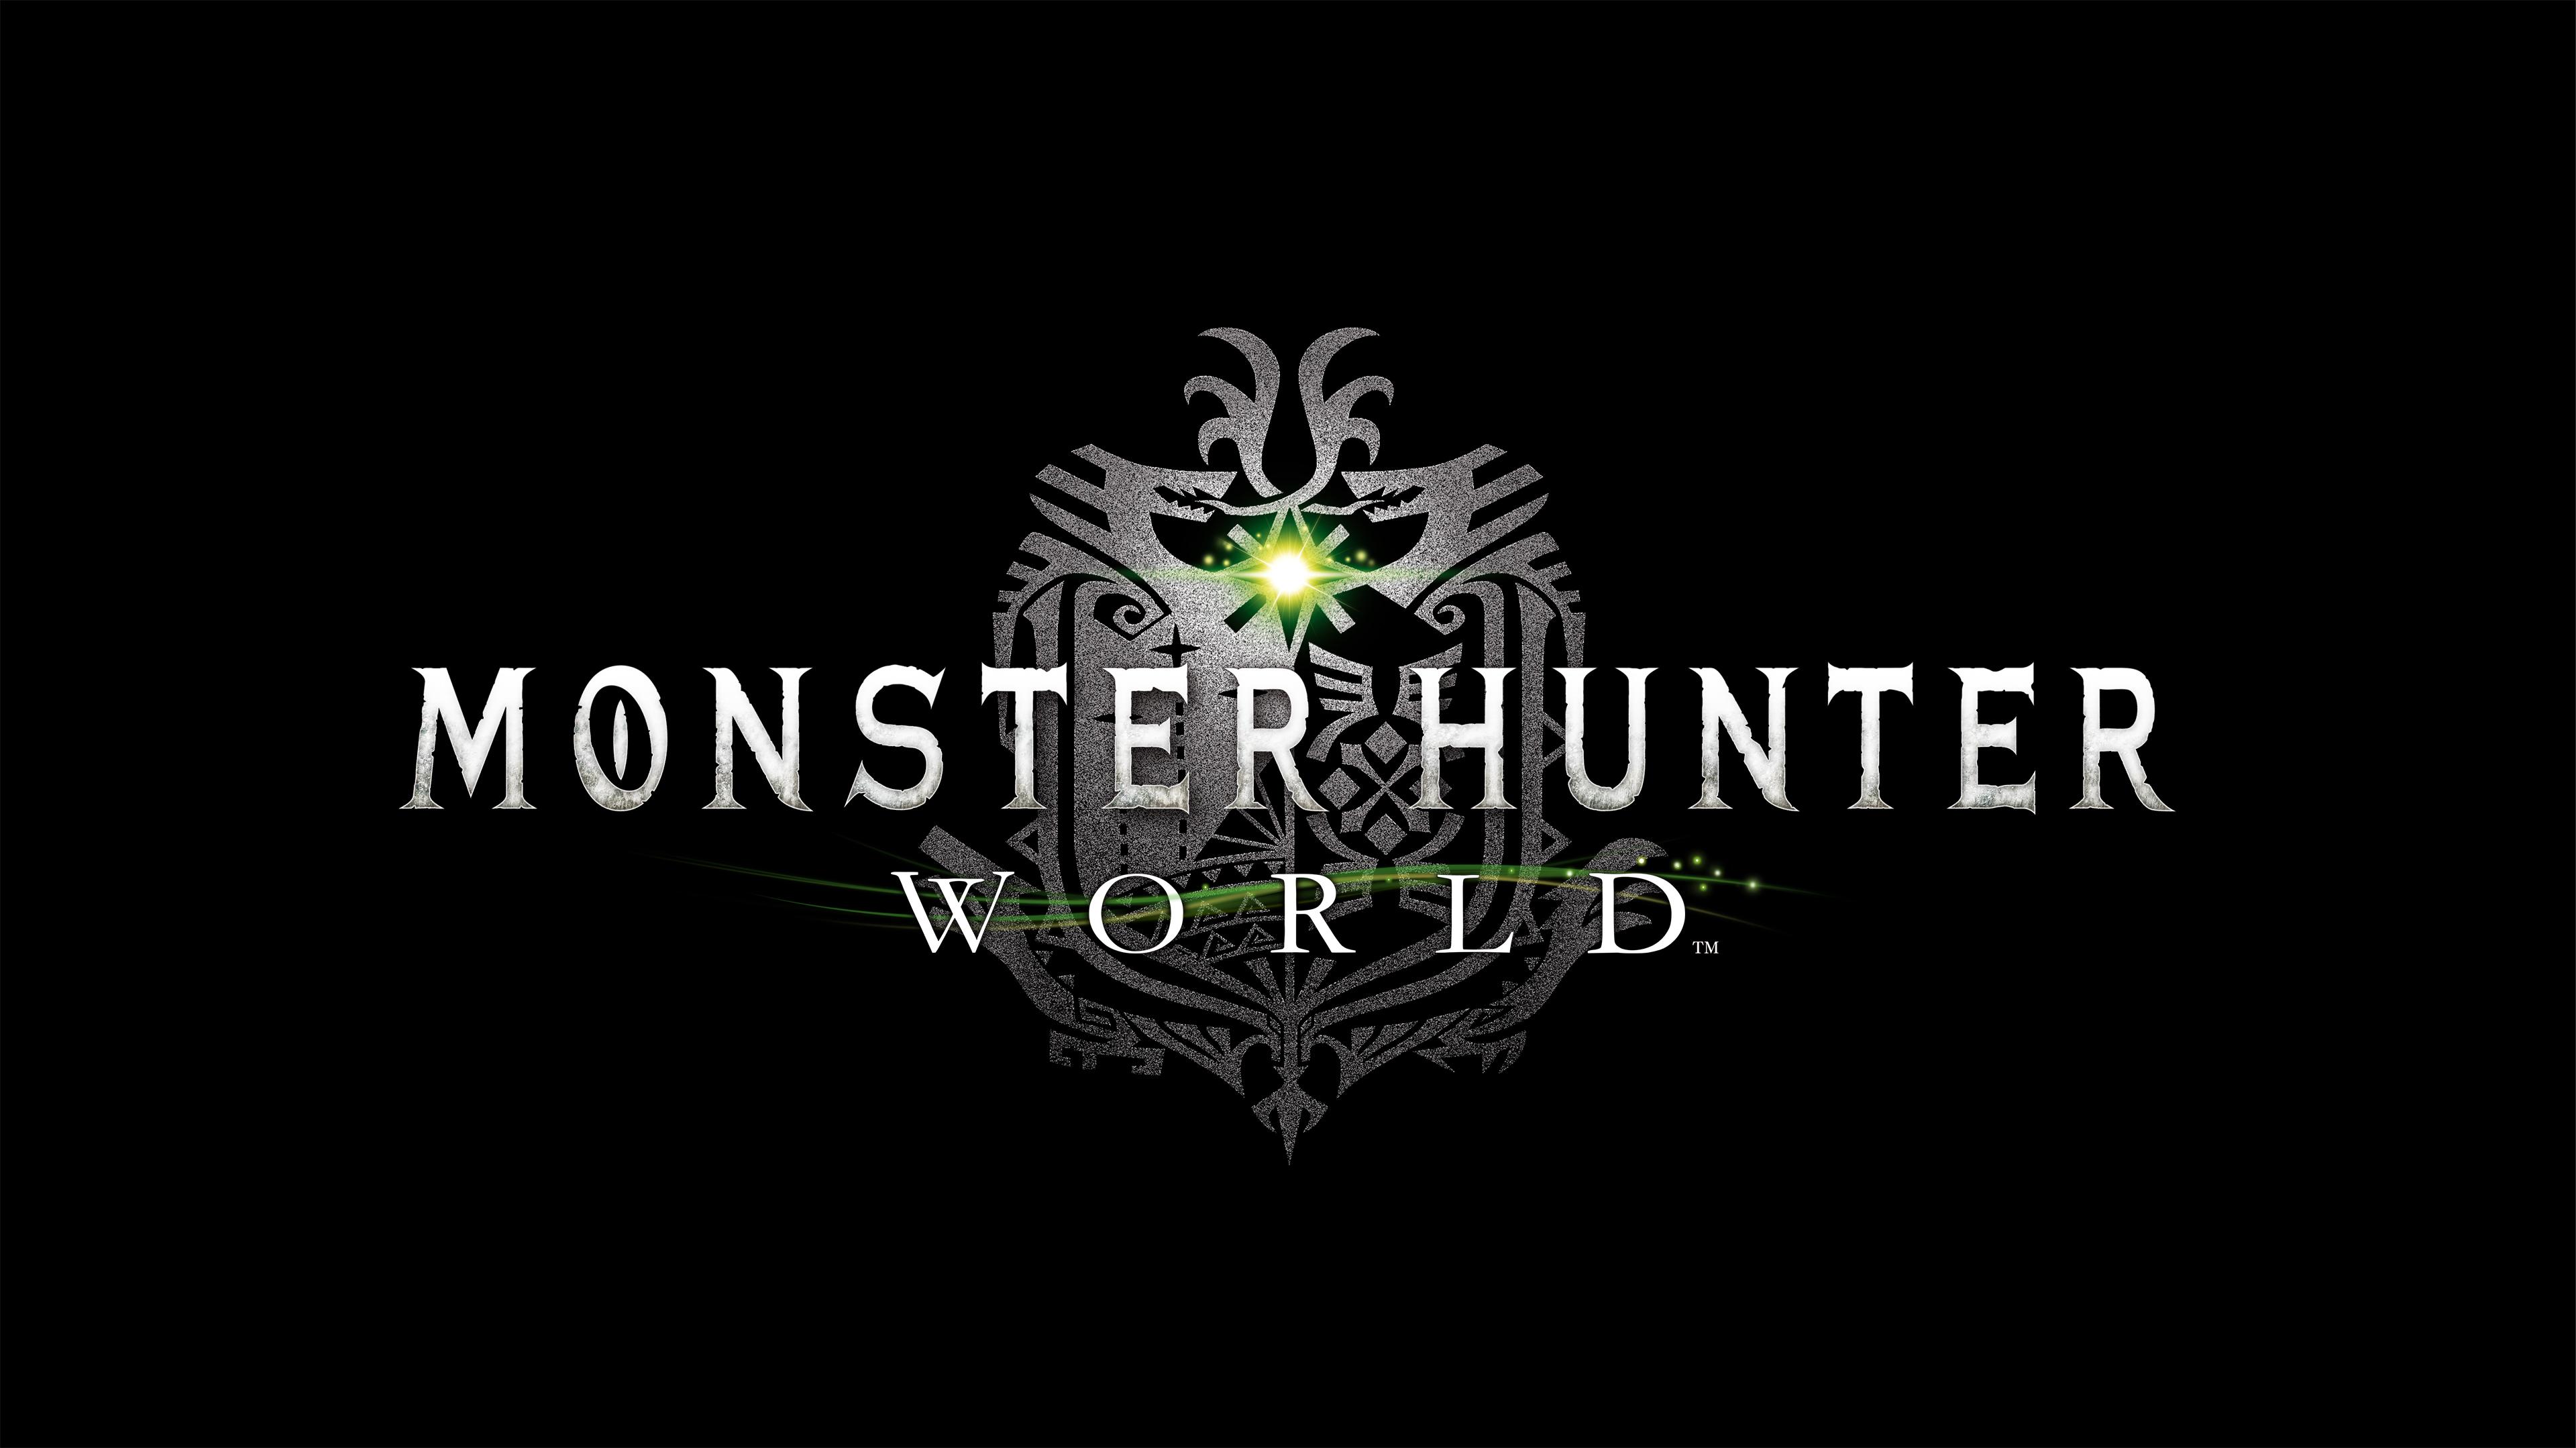 1920x1200 Monster Hunter World 1080p Resolution Hd 4k Wallpapers